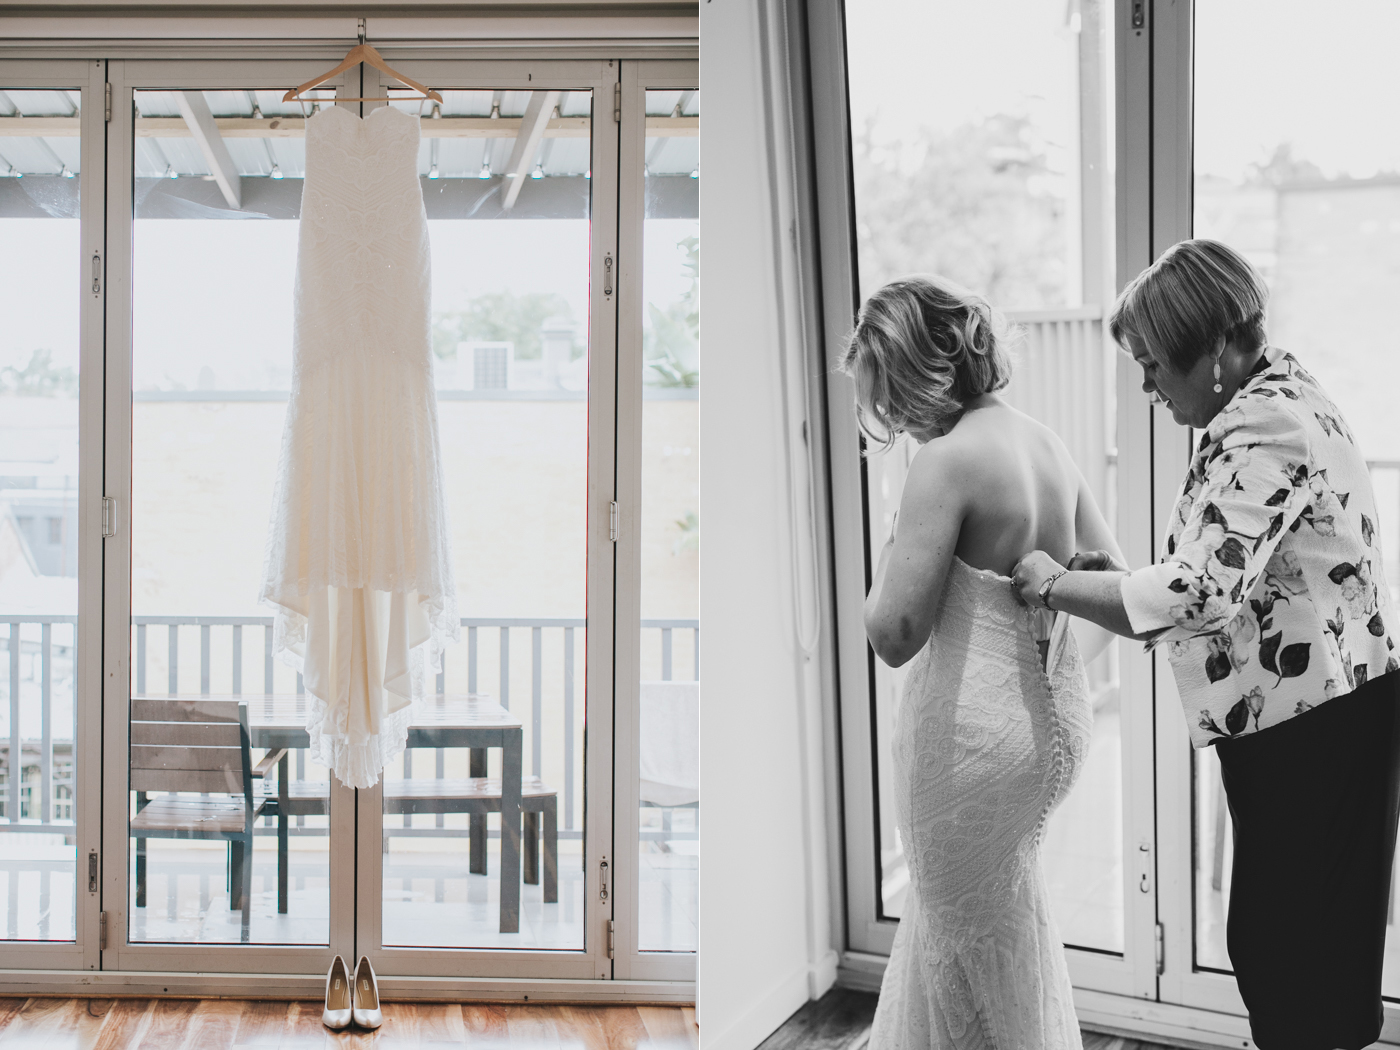 Jo & Tom Wedding - The Grounds of Alexandria - Samantha Heather Photography-57.jpg